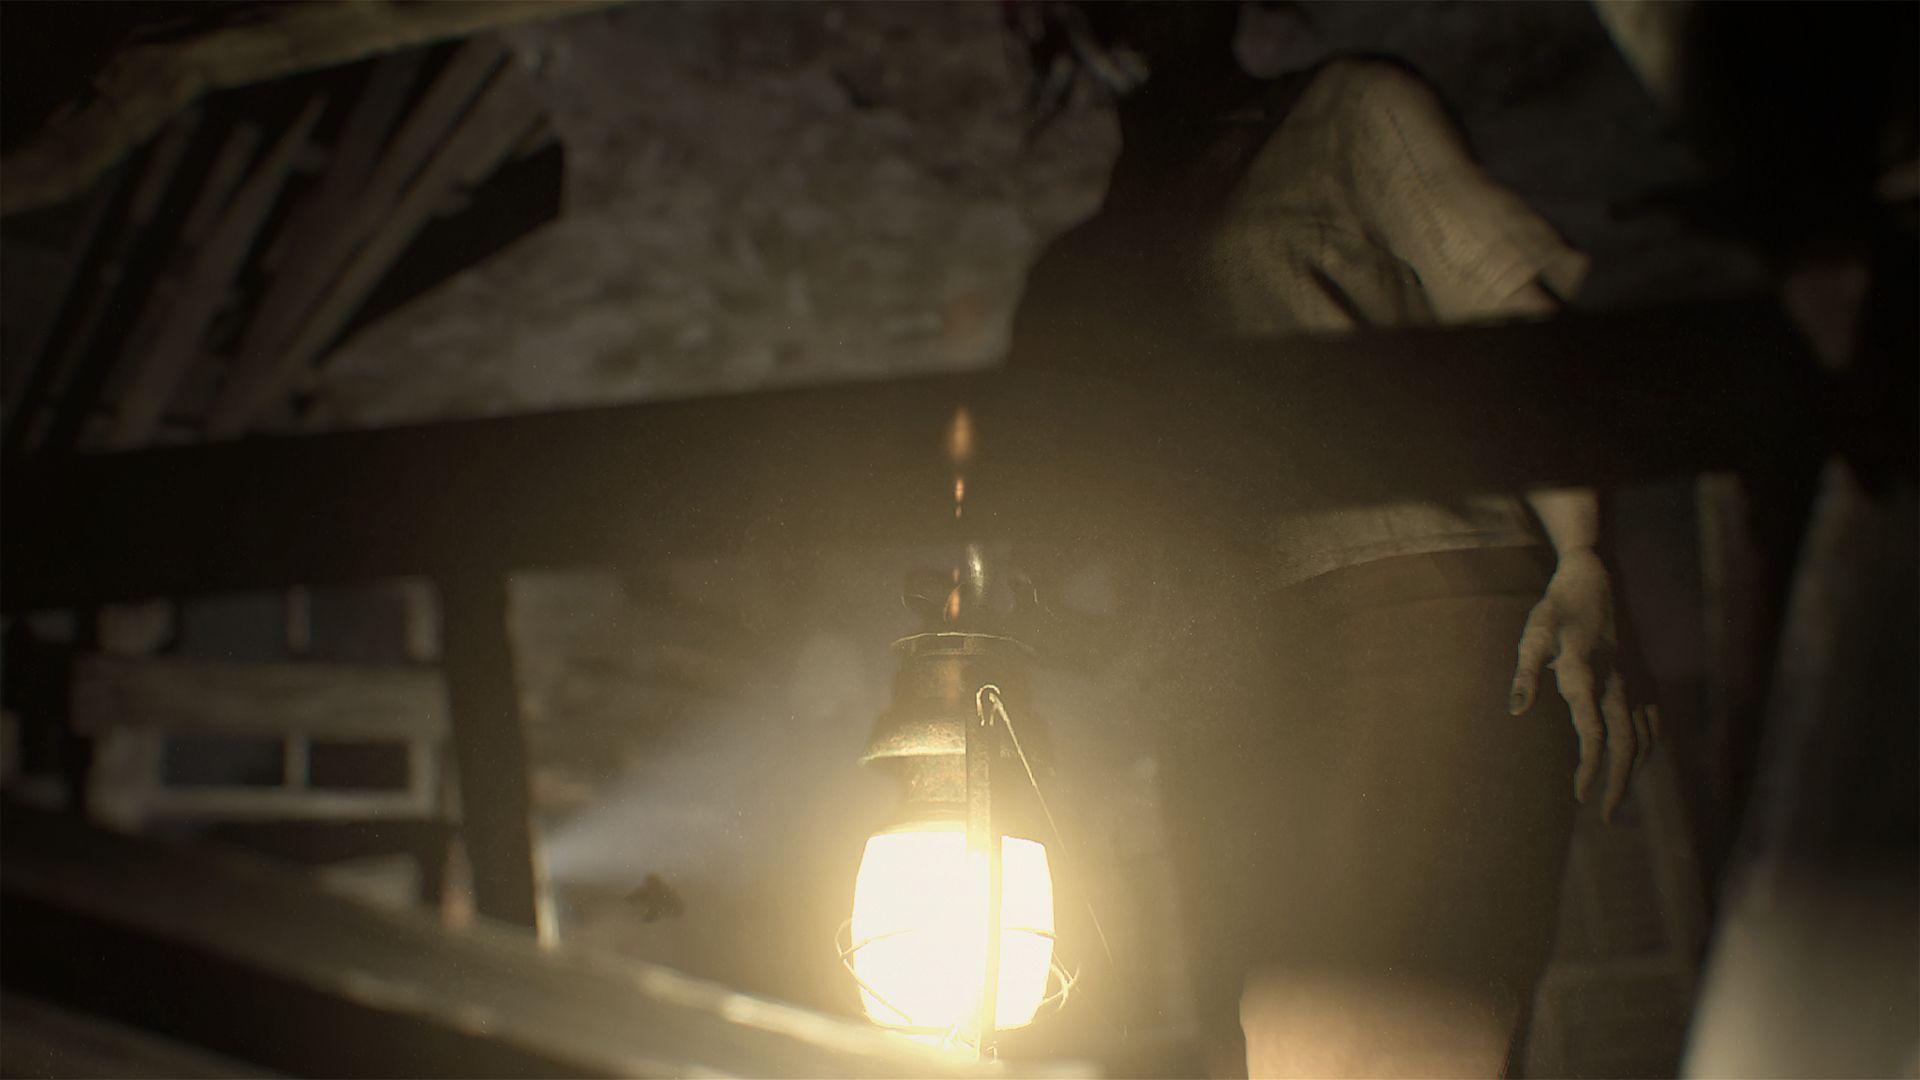 resident evil 7 biohazard lantern demo